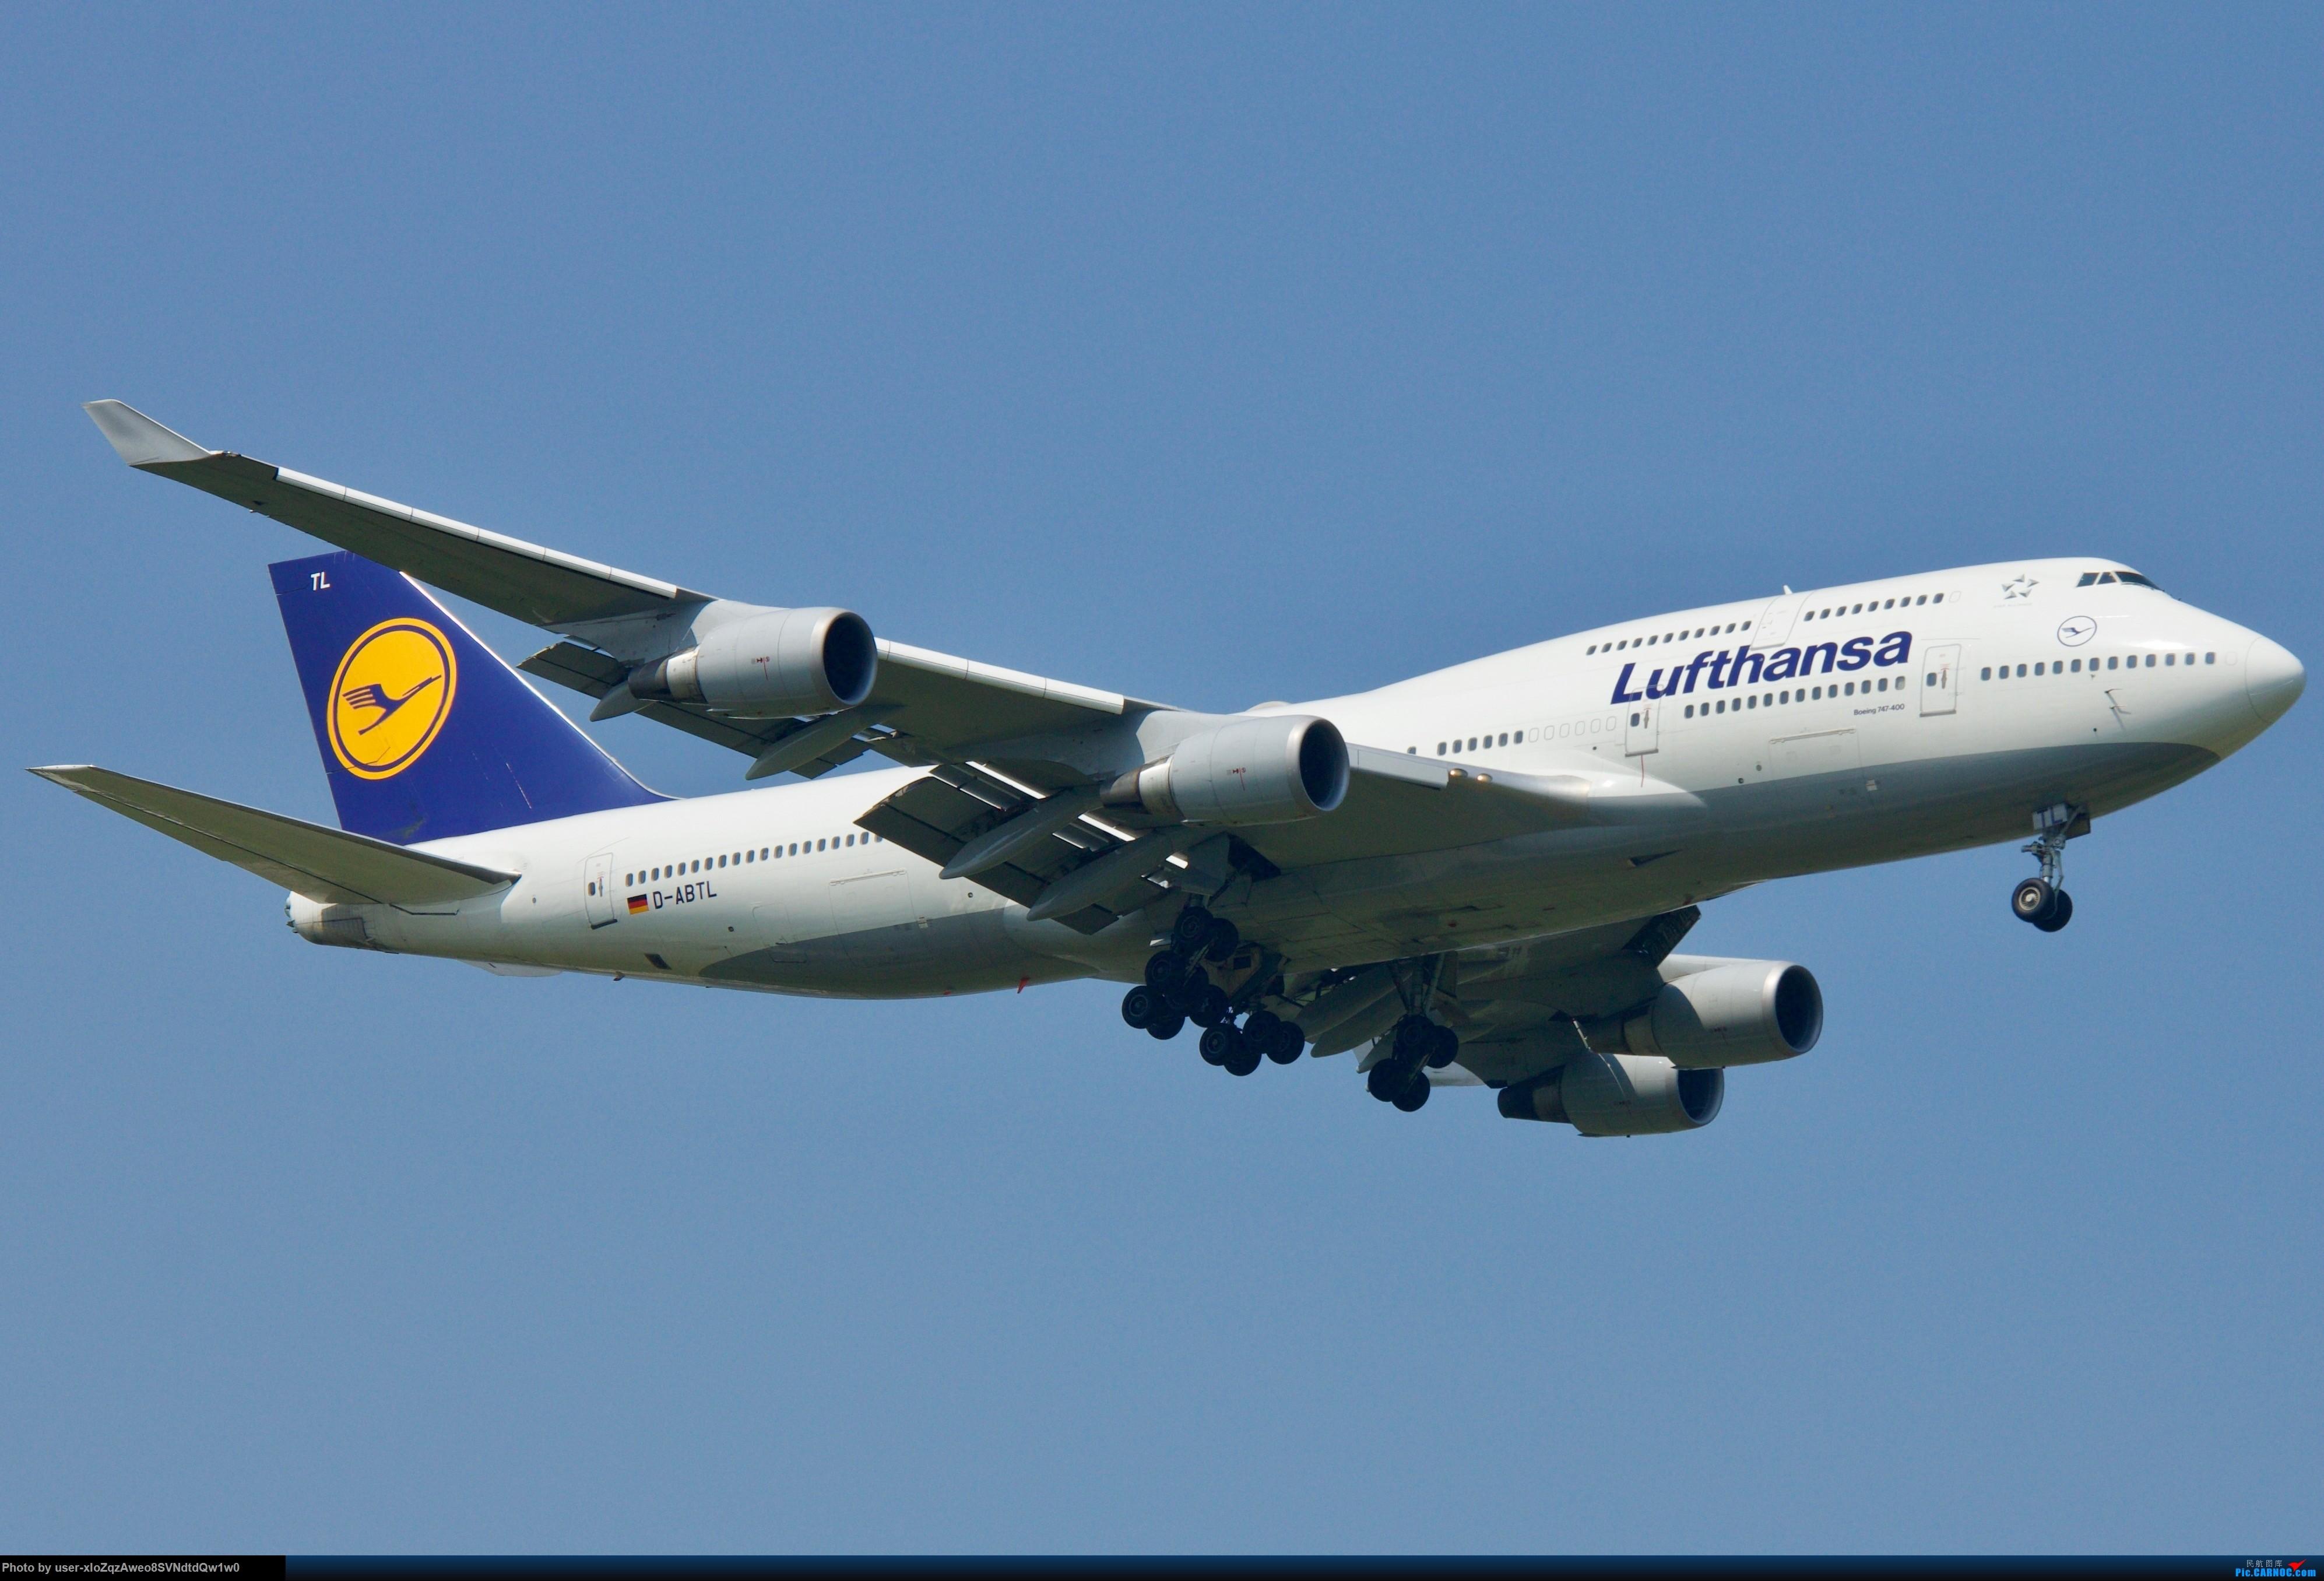 Re:[原创]07/28 PVG拍机贴 BOEING 747-400 D-ABTL 中国上海浦东国际机场